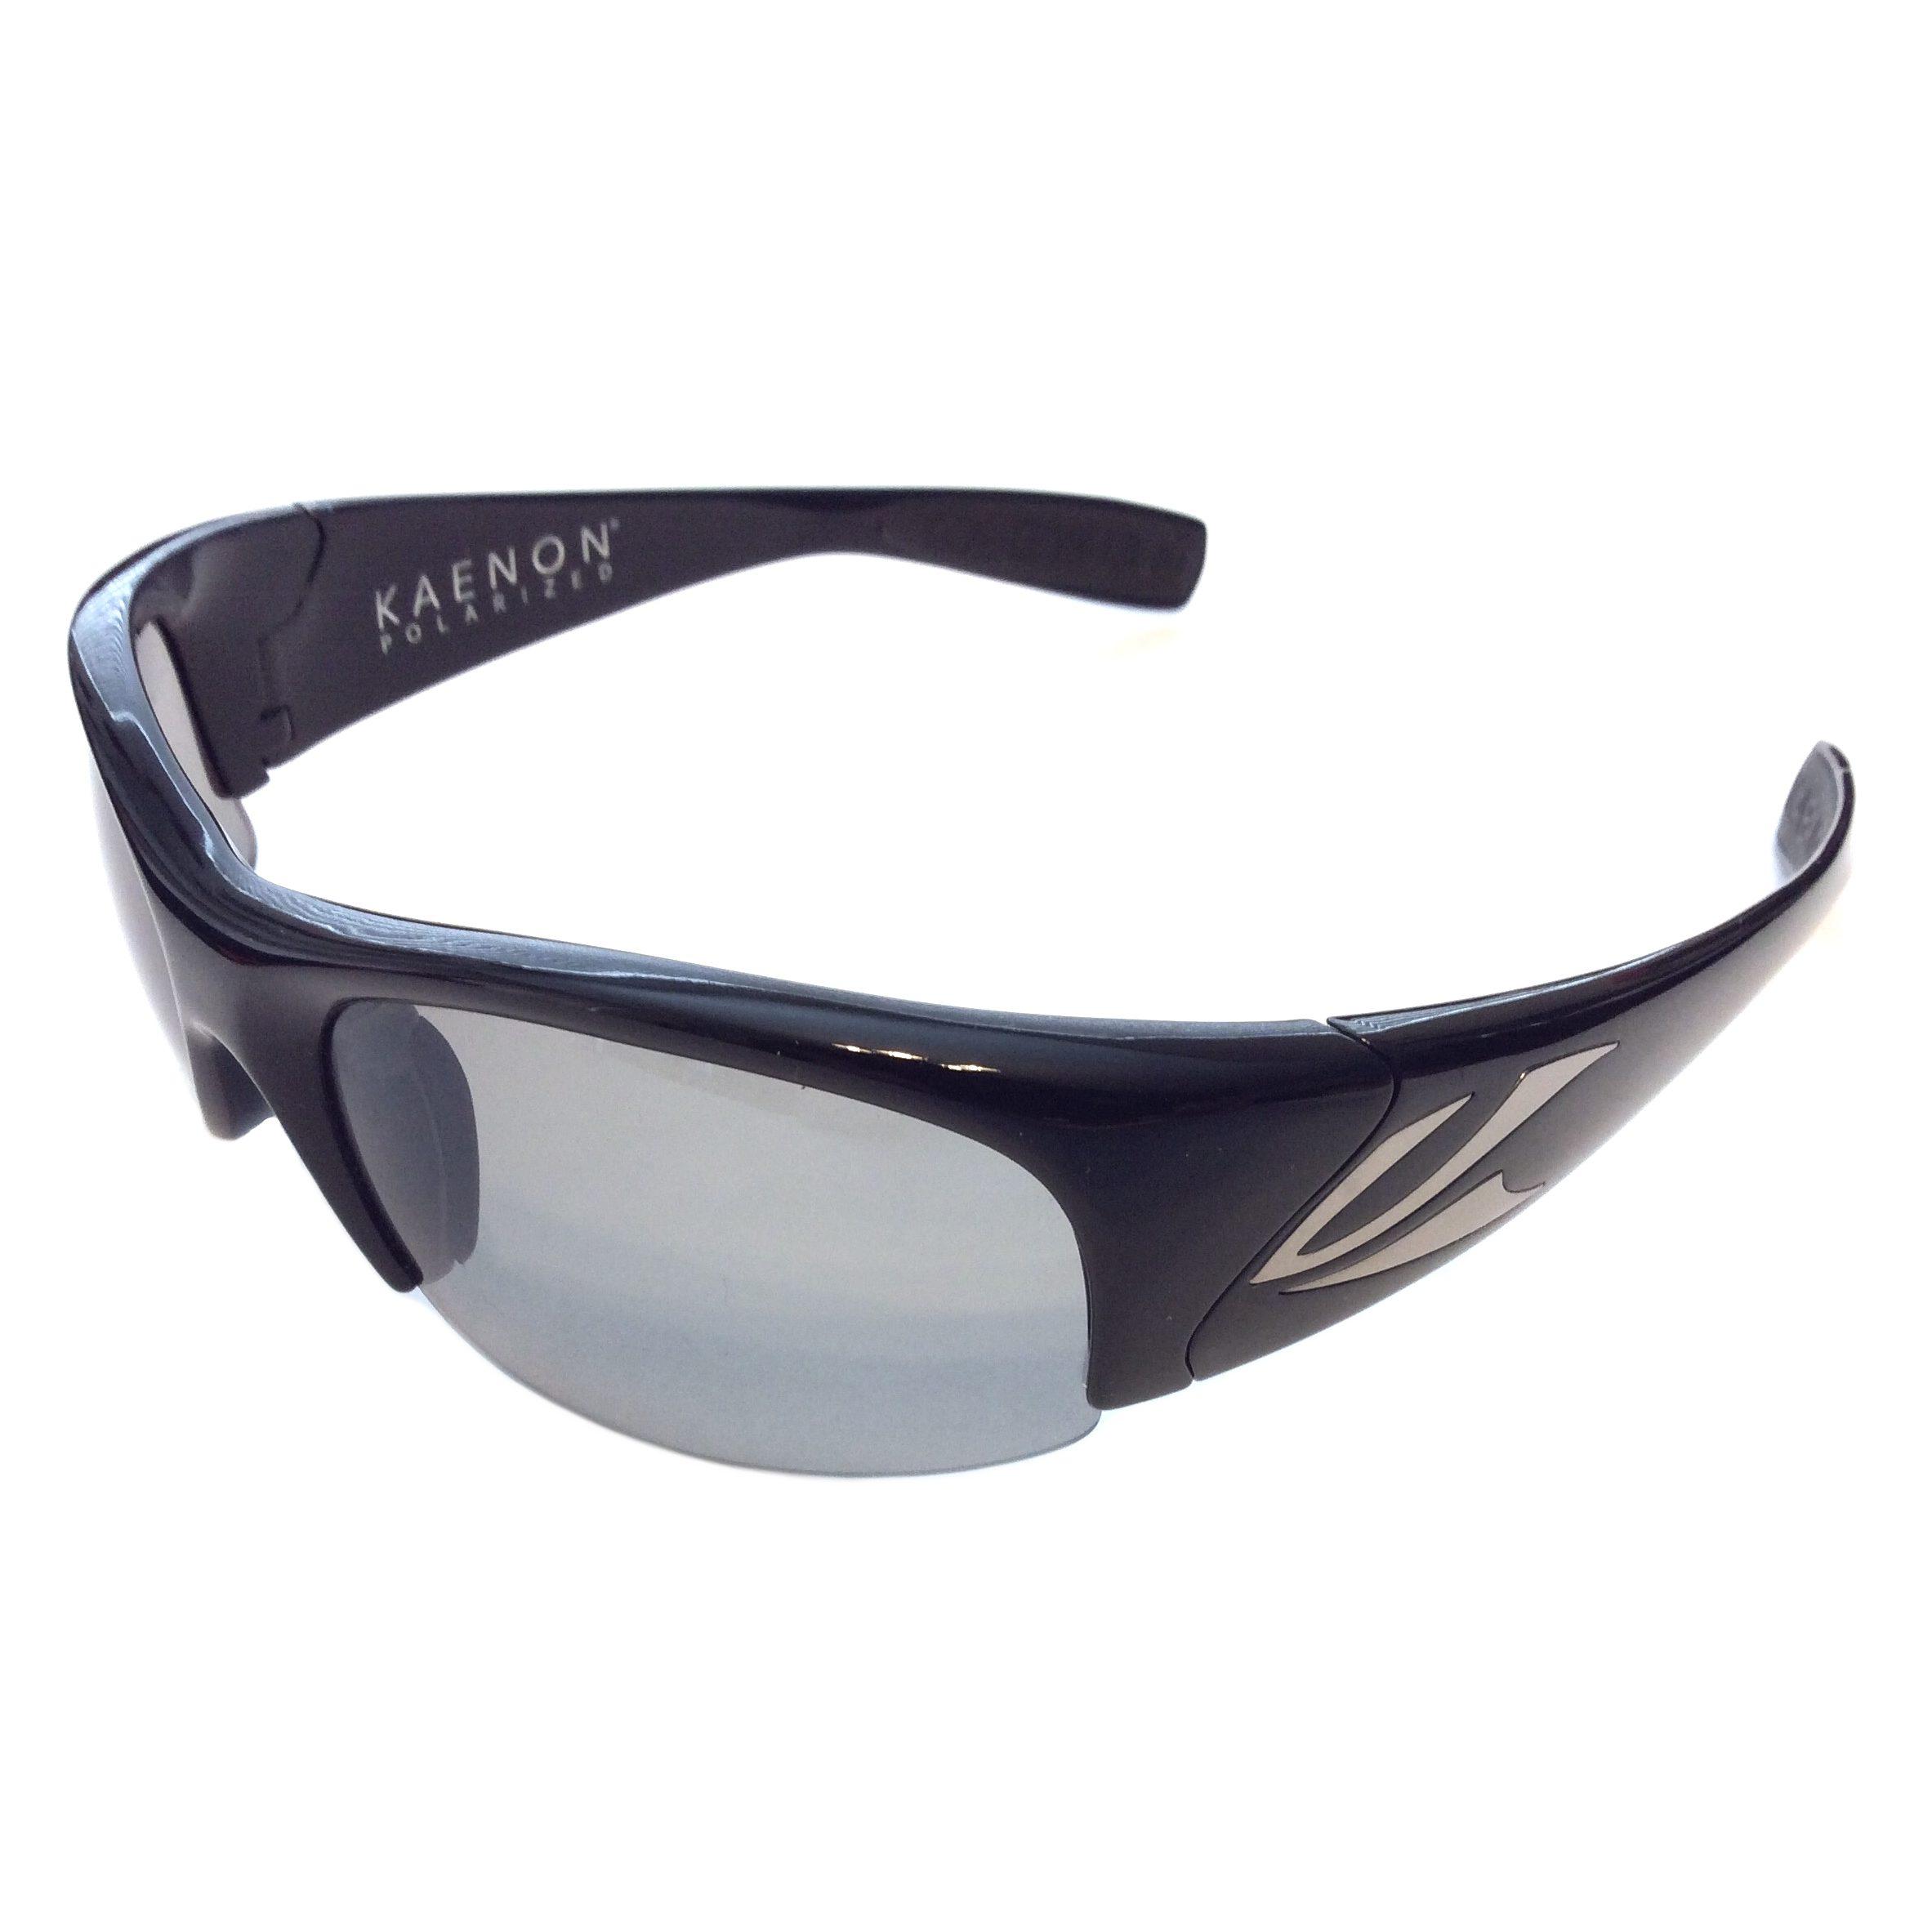 9255ccf87427f Kaenon Hard Kore Sunglasses – Black Frame – Polarized Grey – G28 ...